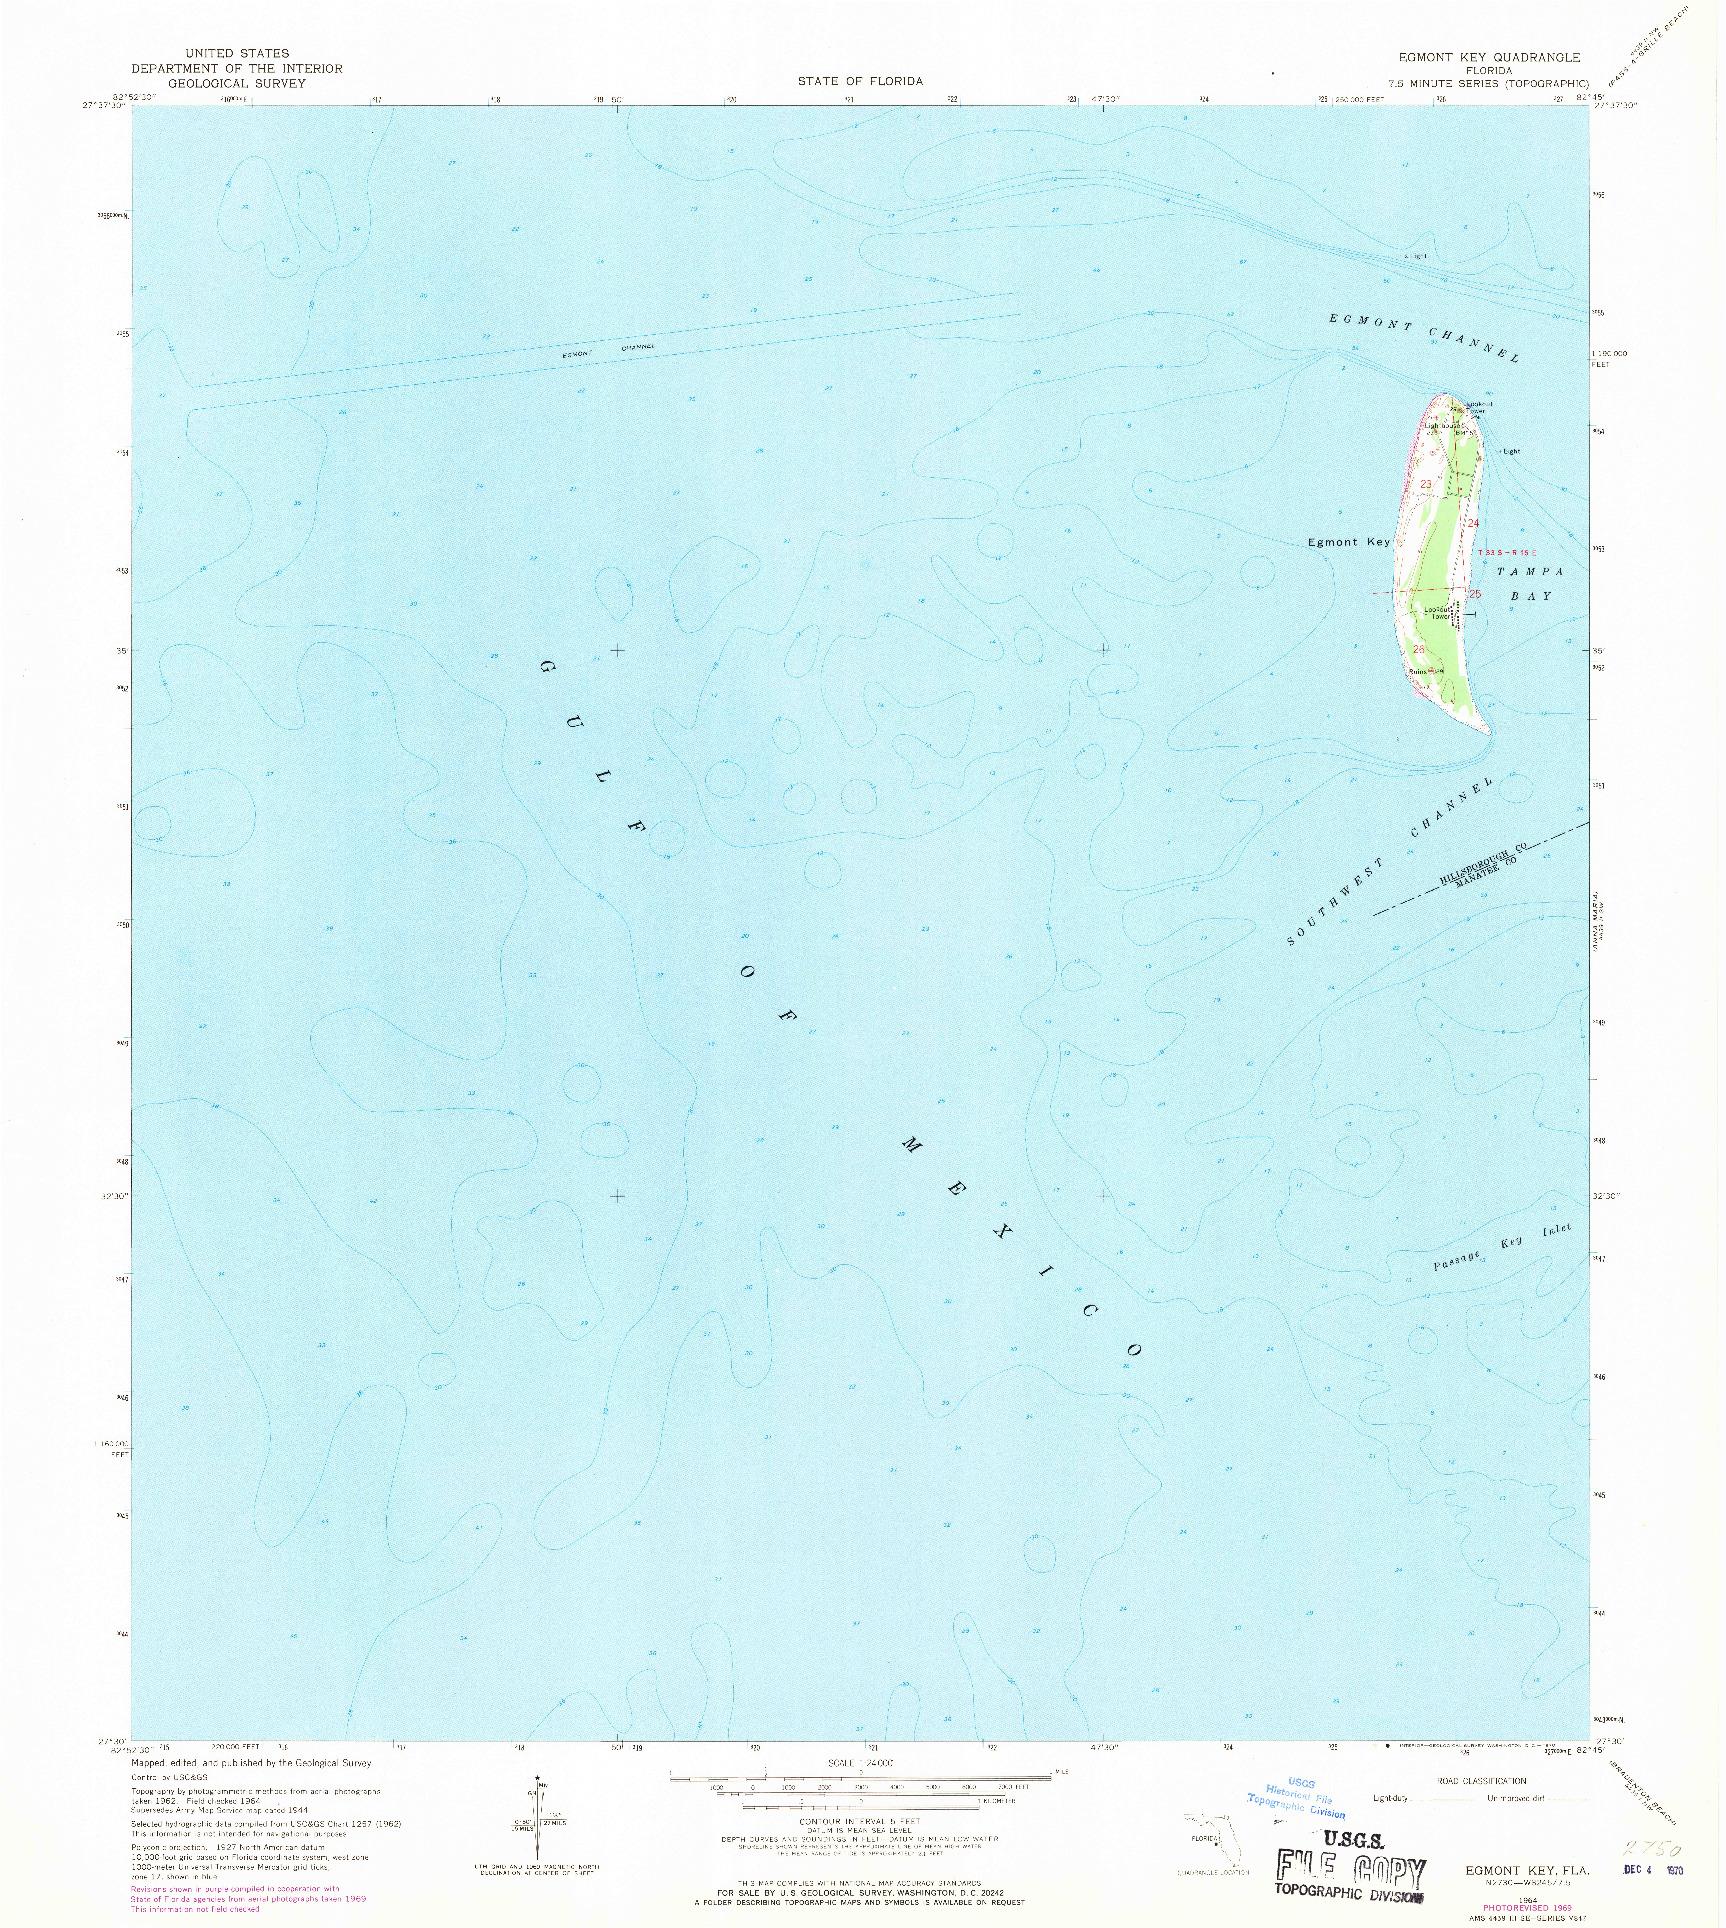 USGS 1:24000-SCALE QUADRANGLE FOR EGMONT KEY, FL 1964